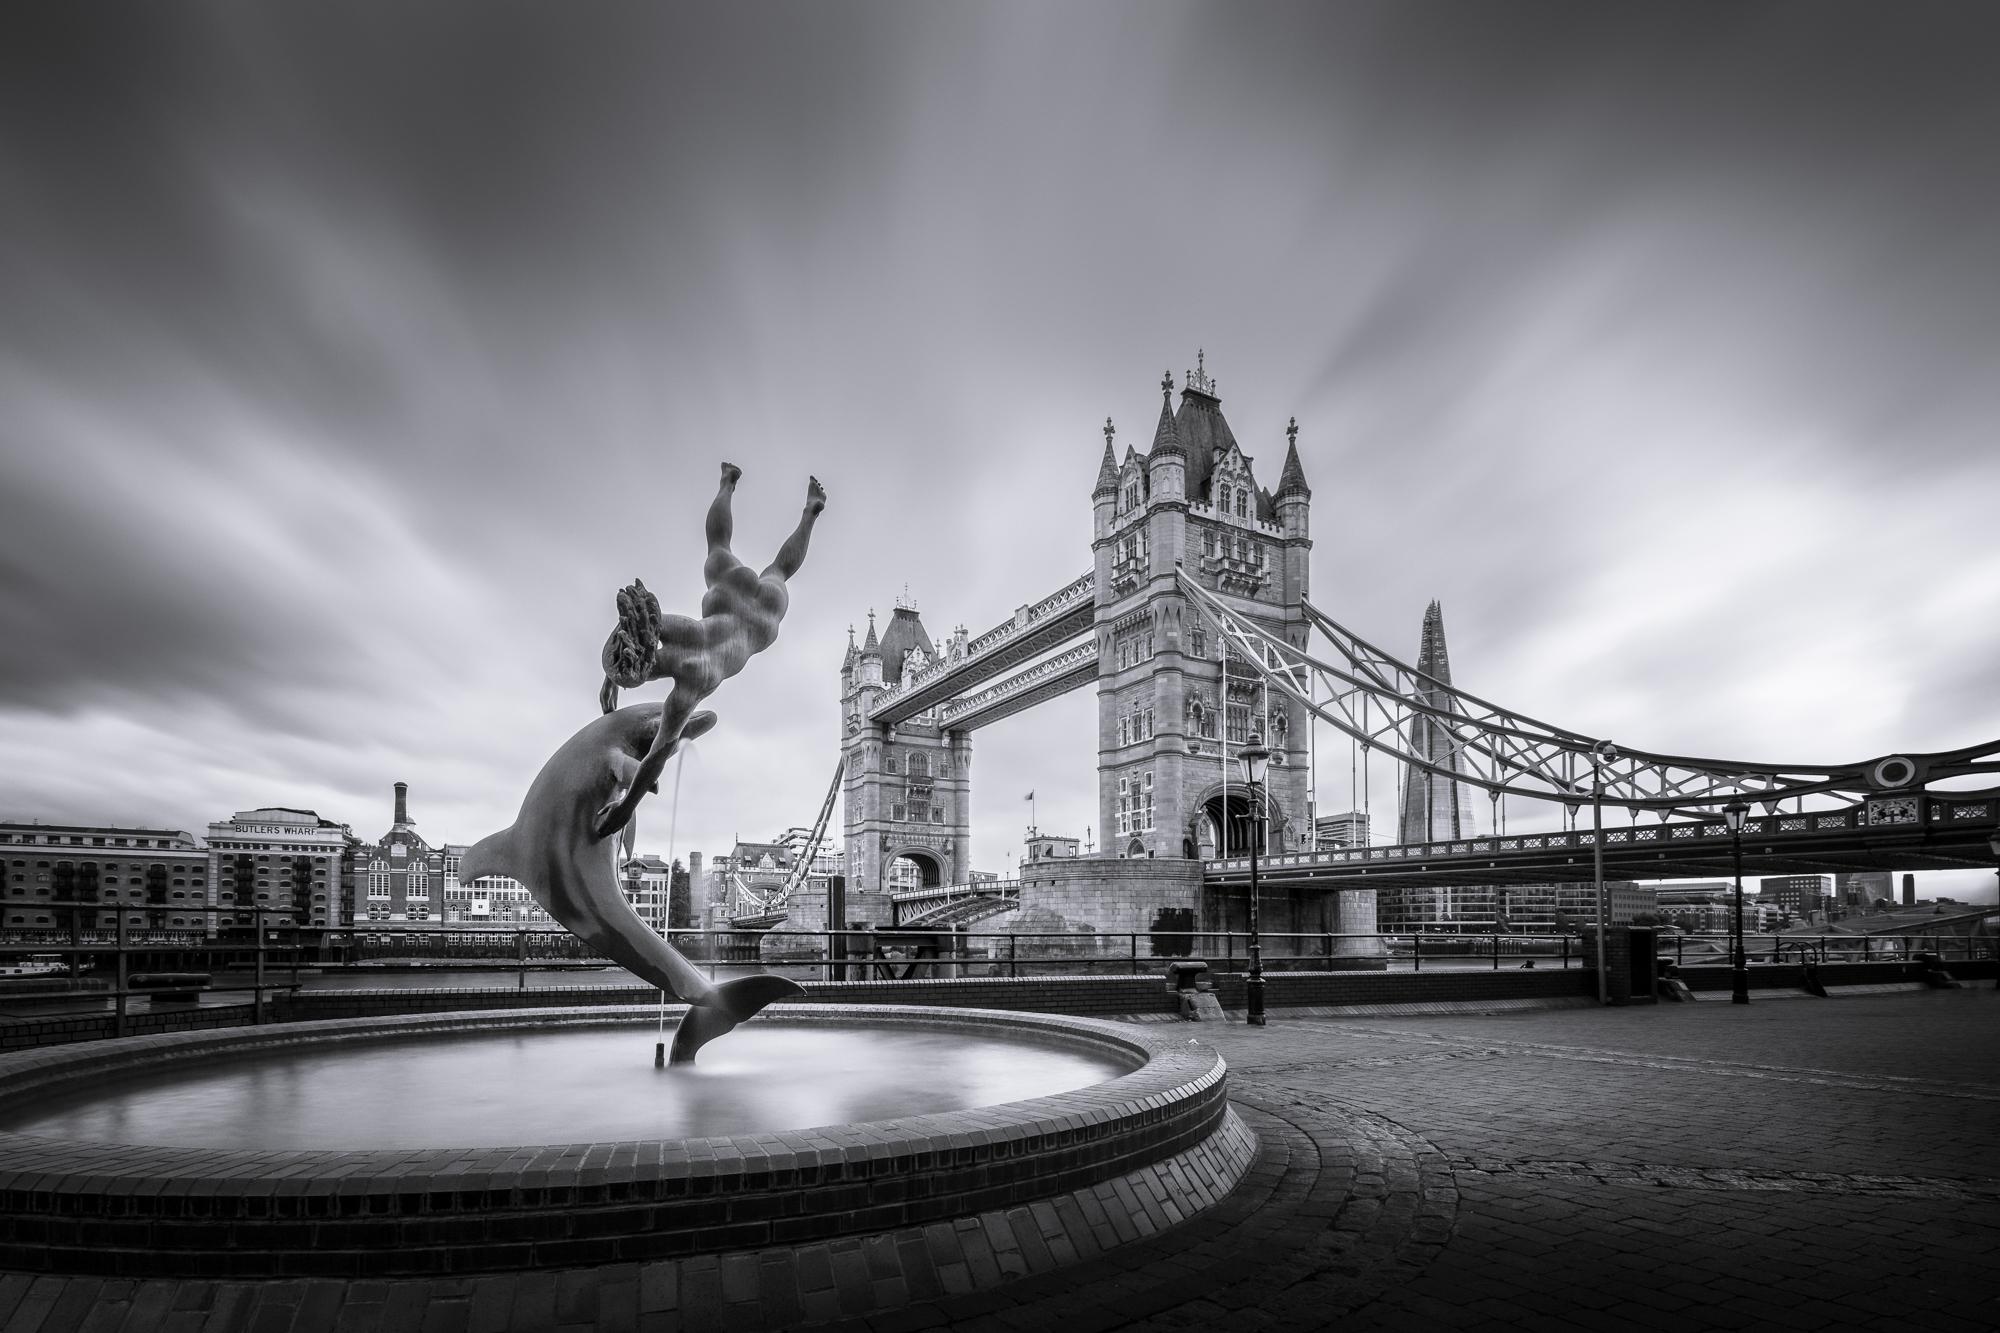 Tower Bridge and The Shard | Fujifilm XT-30 | XF10-24mm | 10mm | 8 Seconds | f/9 | ISO160